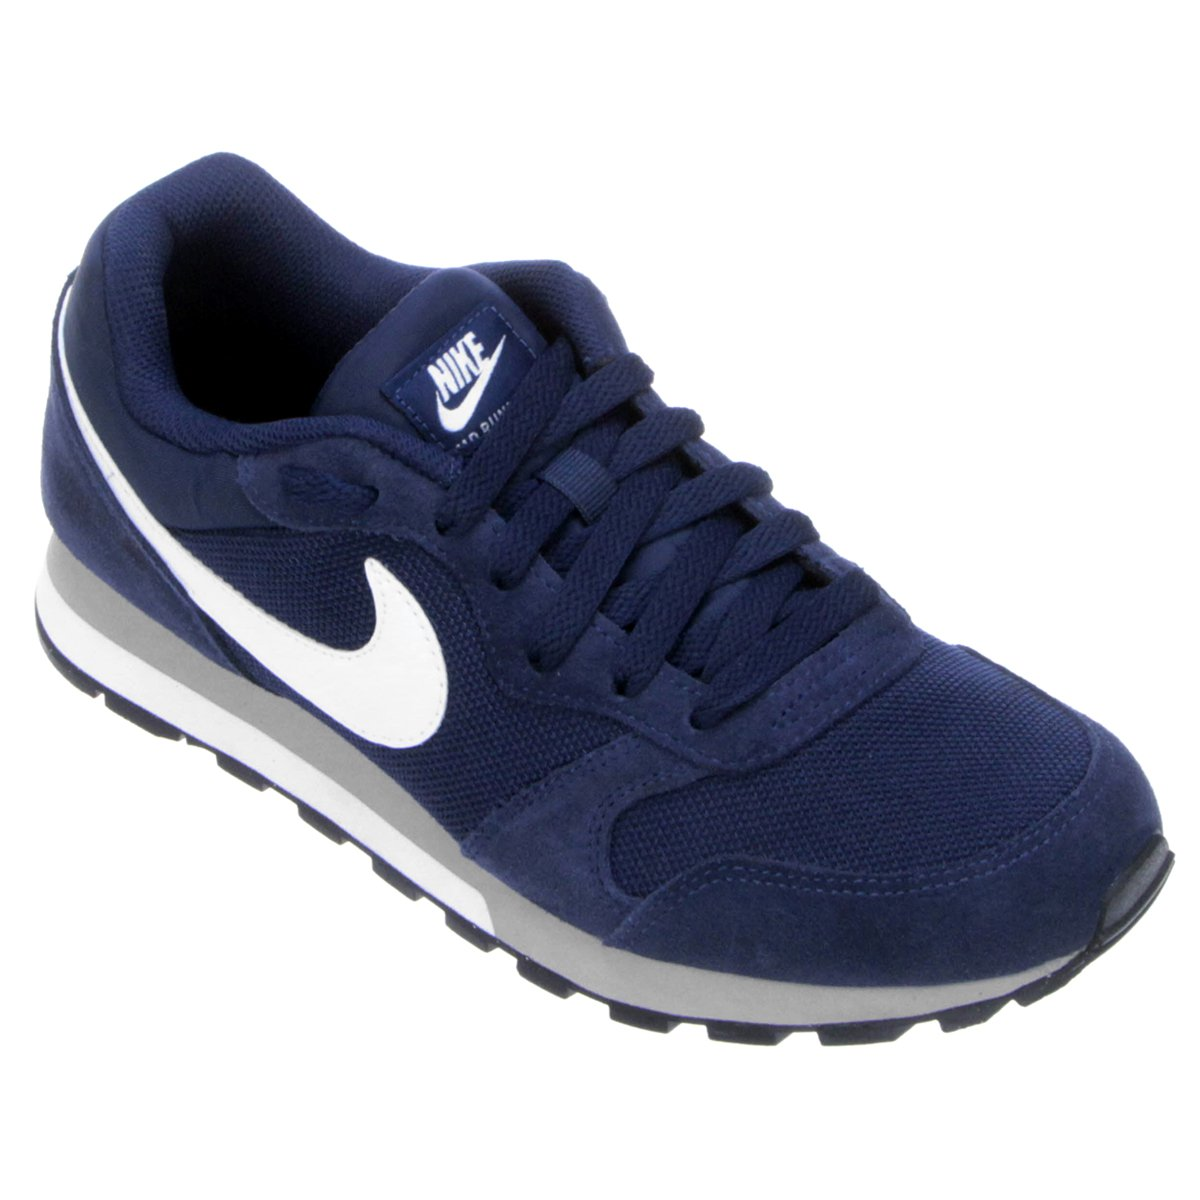 26abf2ad640 Tênis Nike Md Runner 2 Masculino - Marinho e Branco - Compre Agora ...